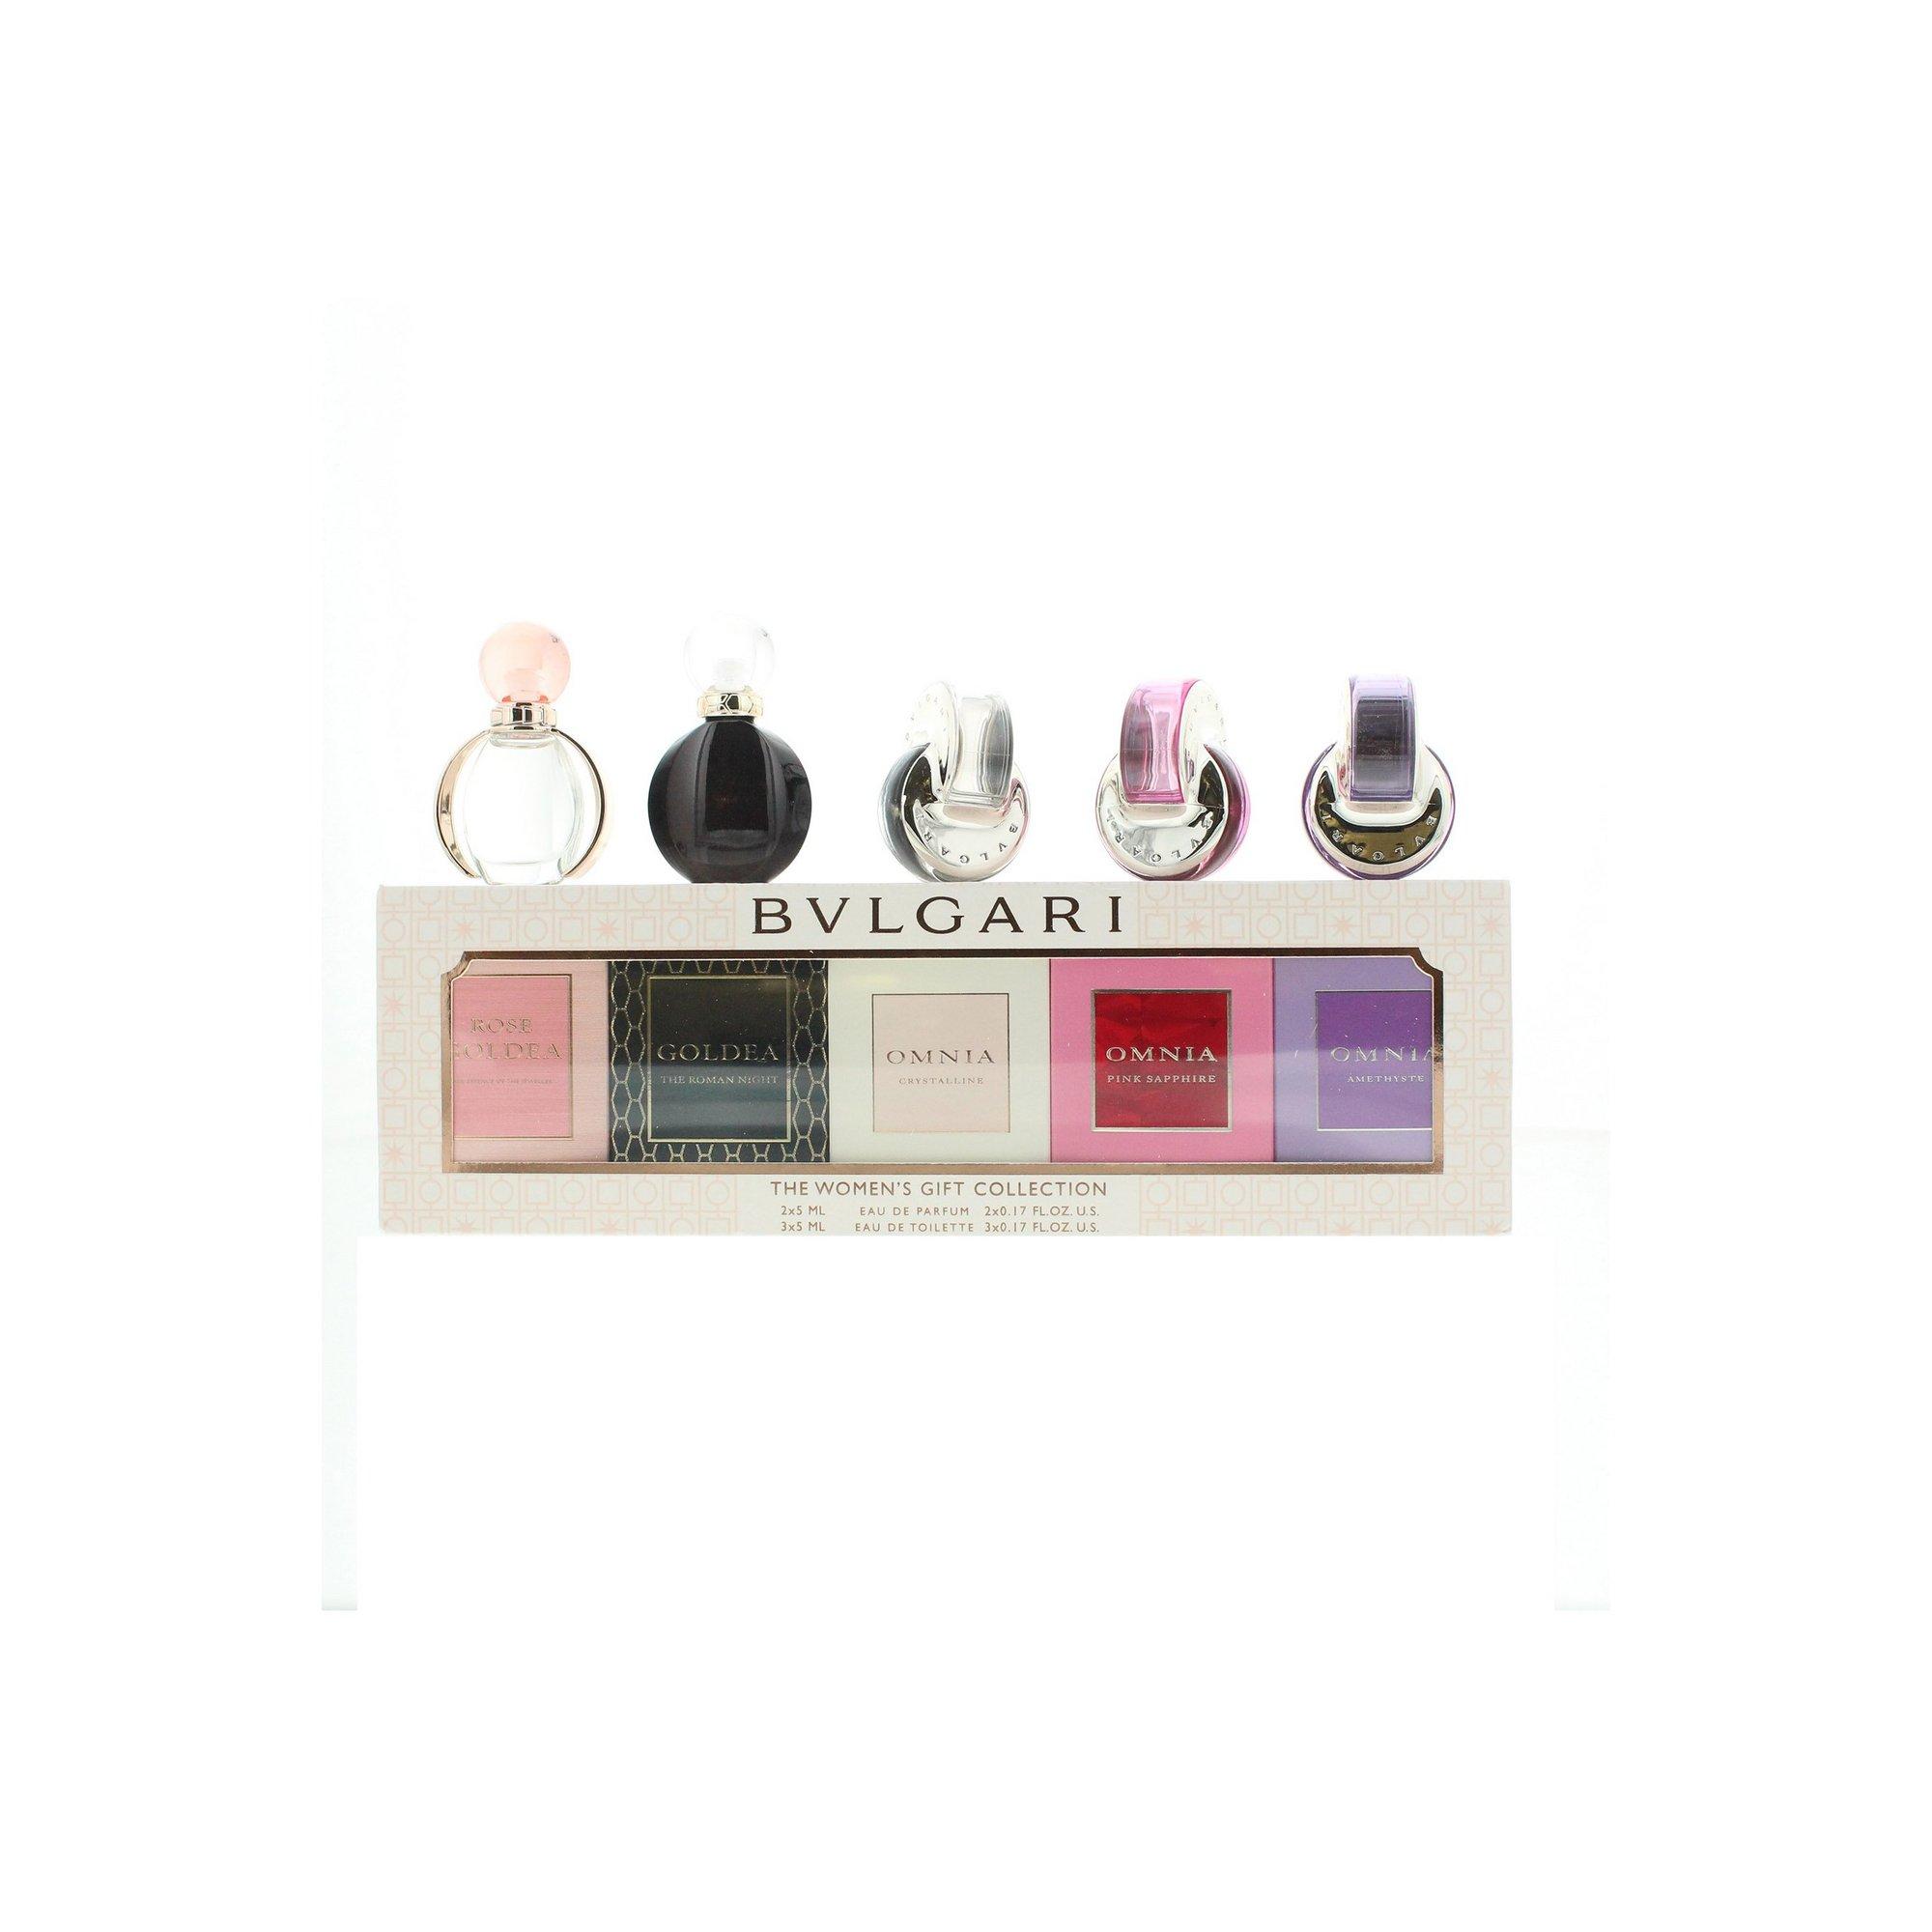 Image of Bvlgari Omnia Miniature Fragrance Gift Set